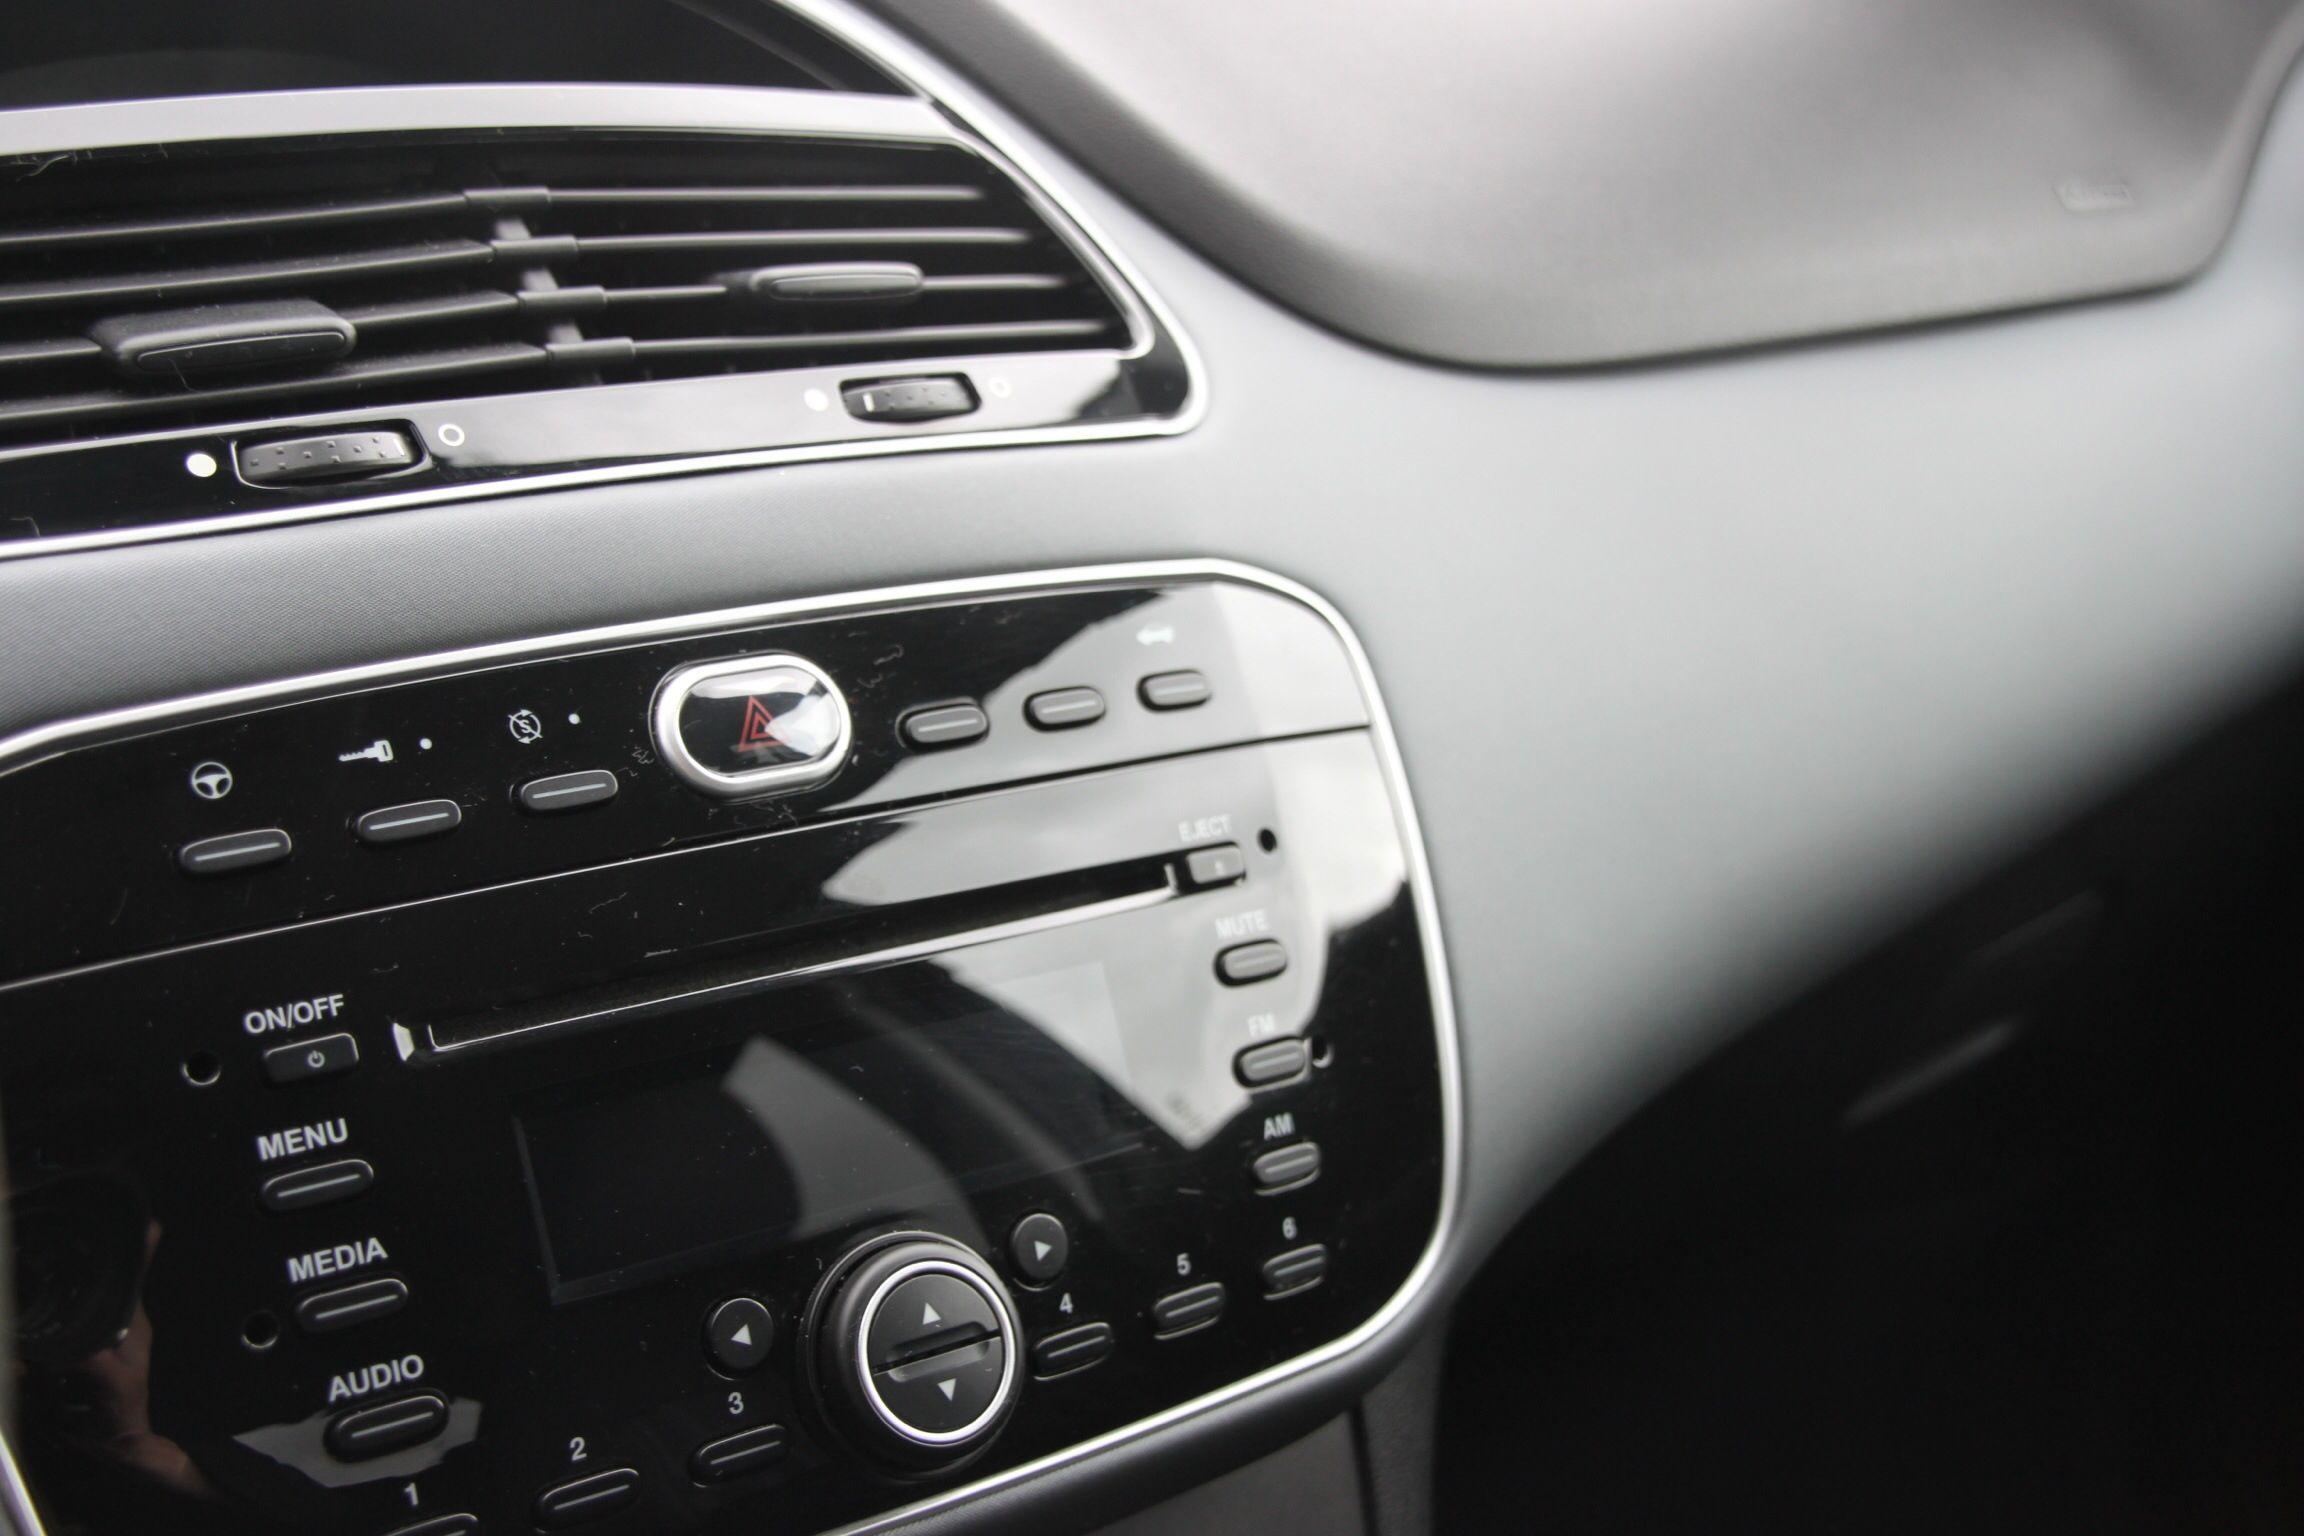 Fiat Punto Evo Interior | Otomobil | Pinterest | Evo, Fiat and Cars